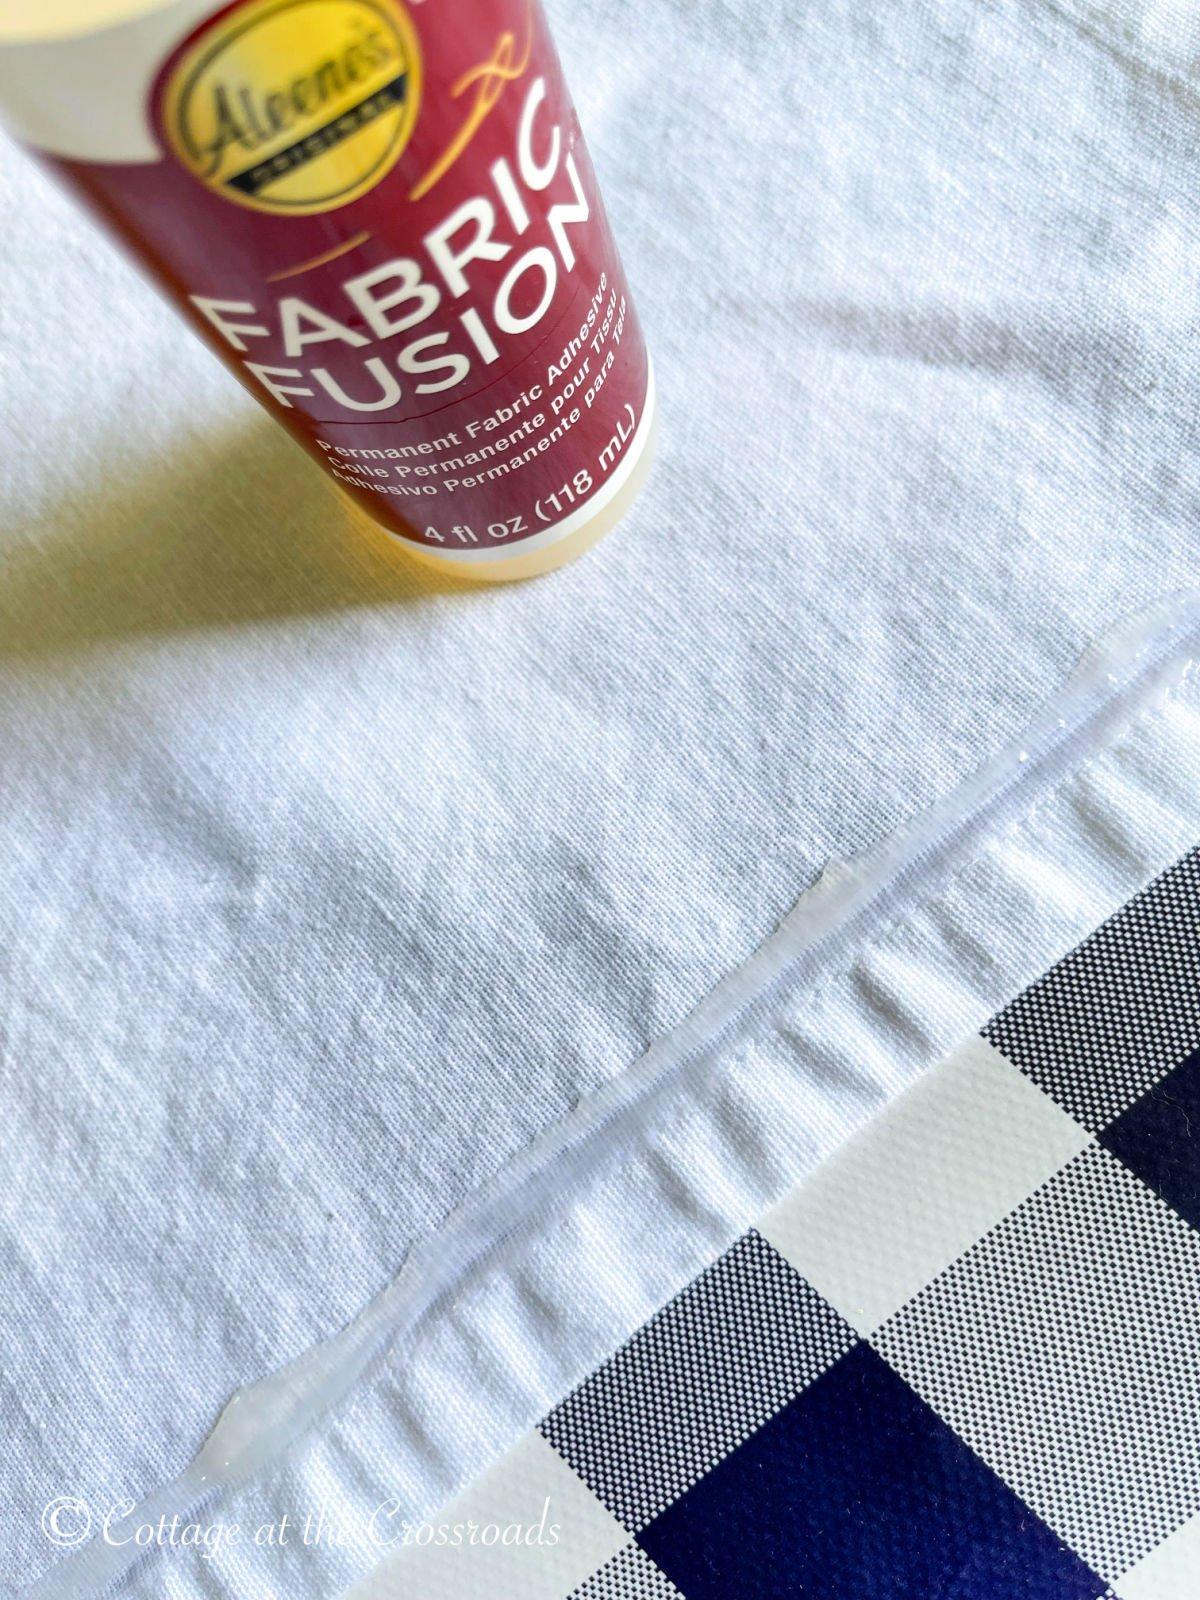 applying fabric glue to tea towel